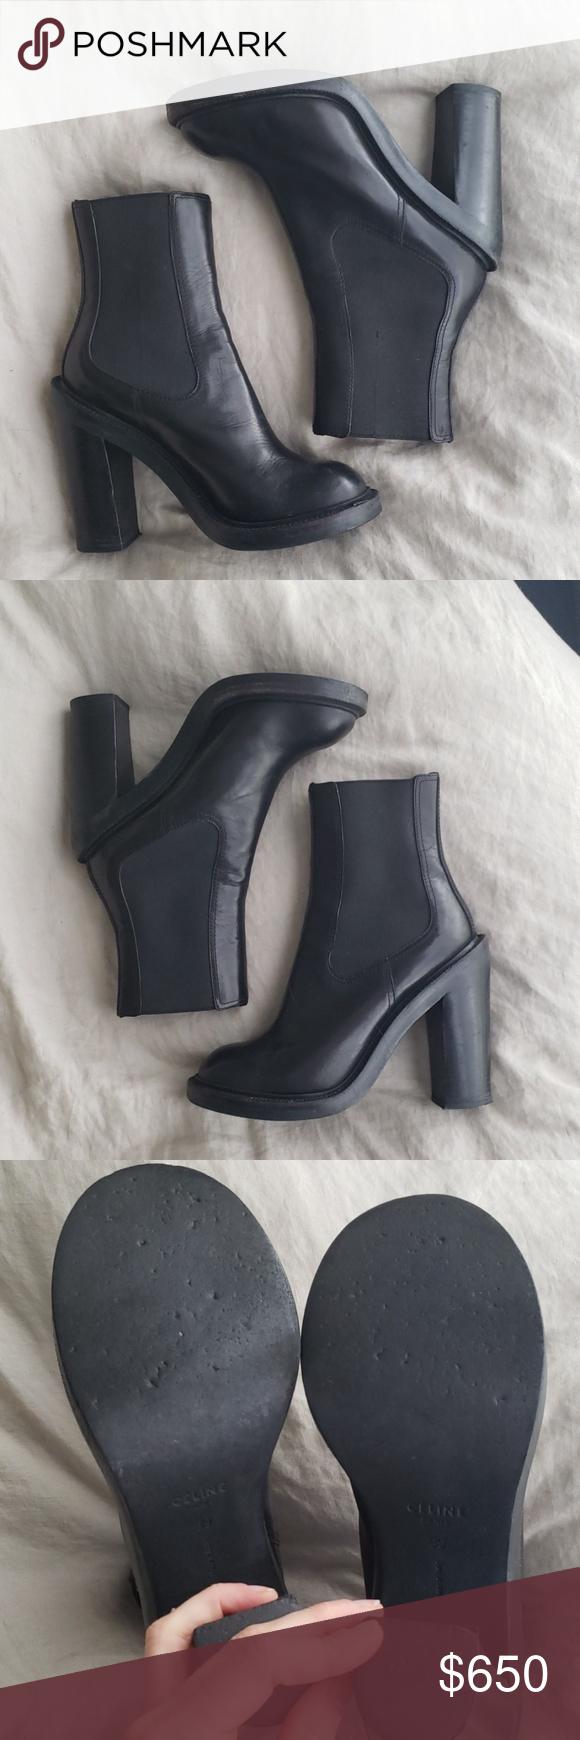 Celine Heeled Chelsea Boots Chelsea boots, Boots, Celine